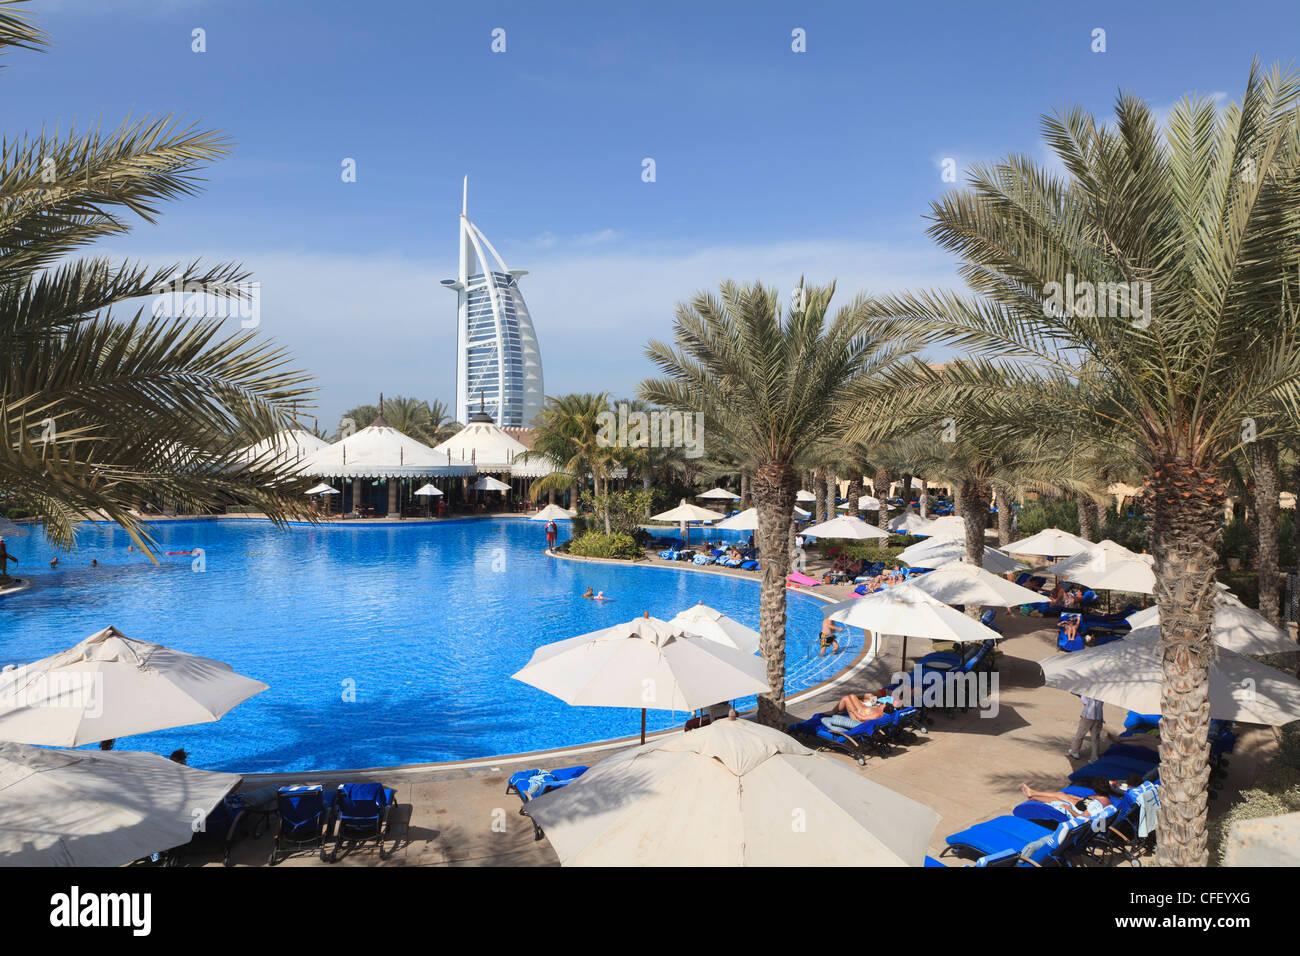 Burj Al Arab Seen From The Swimming Pool Of The Madinat Jumeirah Stock Photo Royalty Free Image